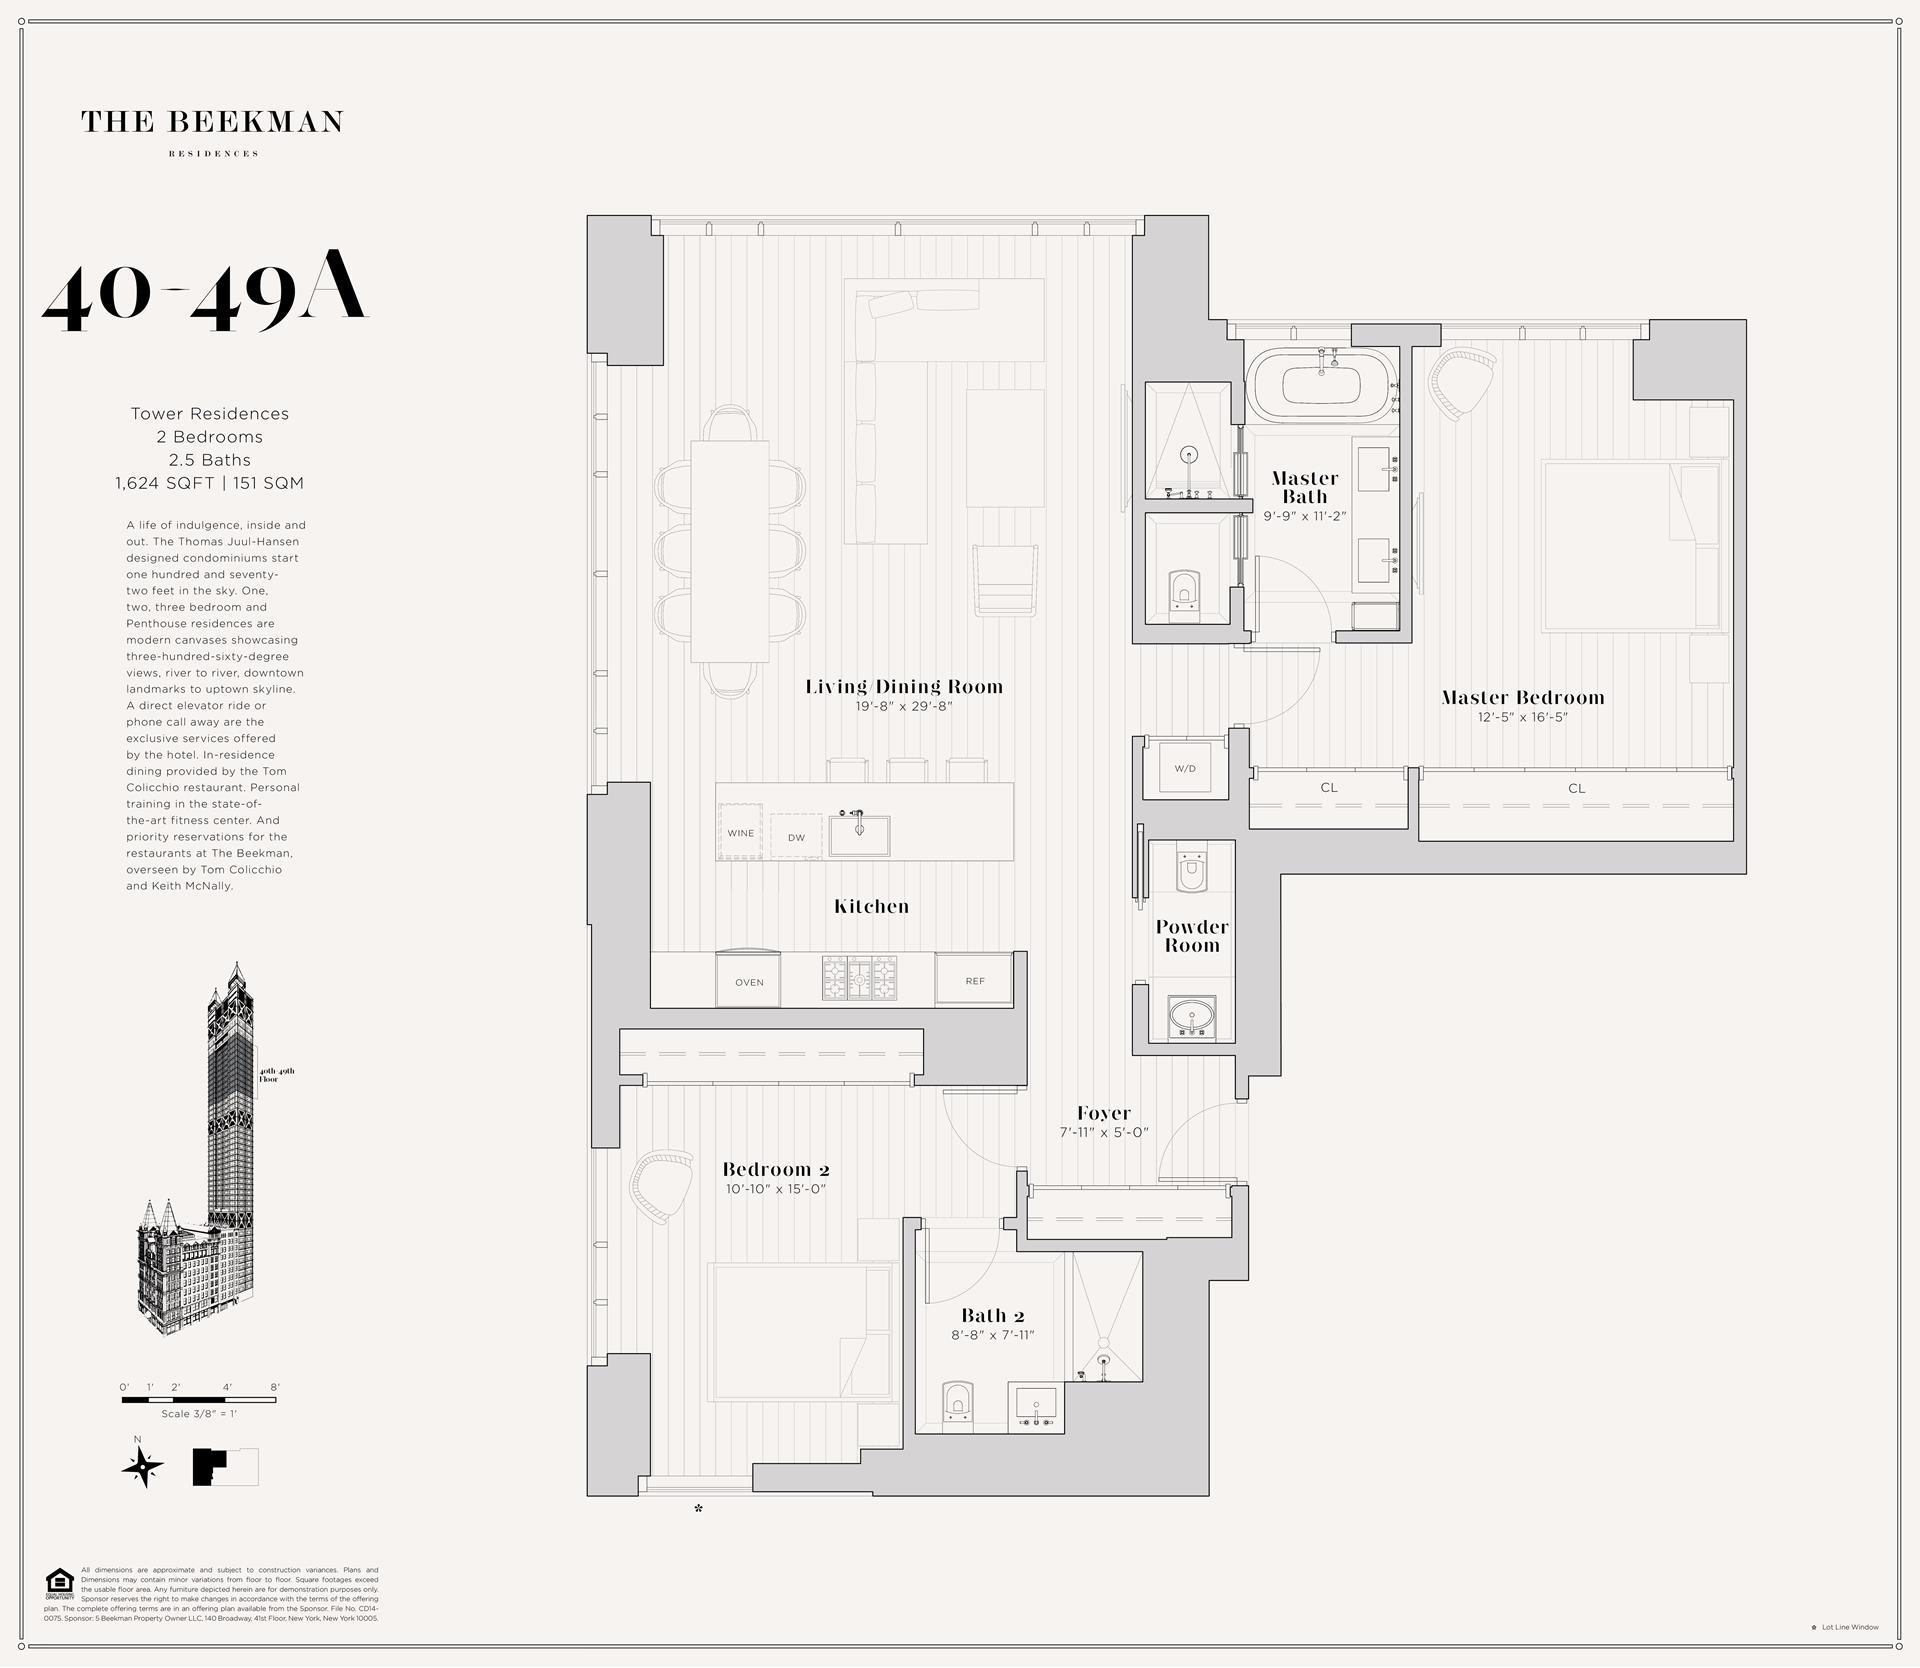 Floor plan of The Beekman Residences, 5 Beekman St, 46A - Financial District, New York